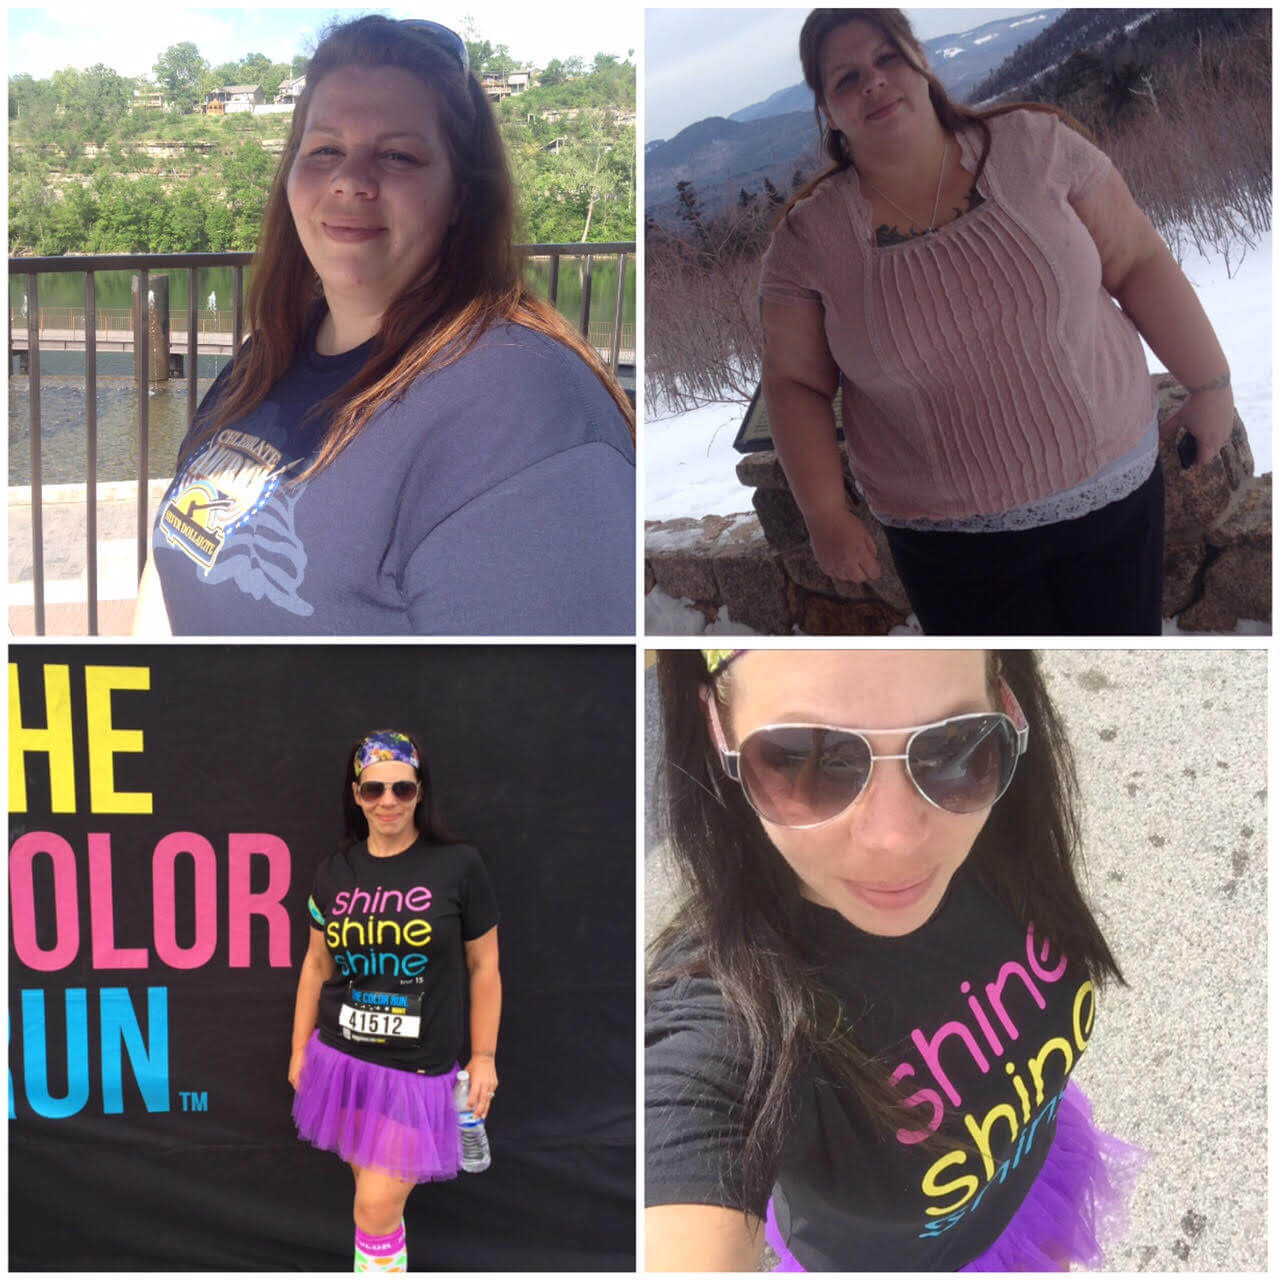 Erica Buteau Lost 150 lbs